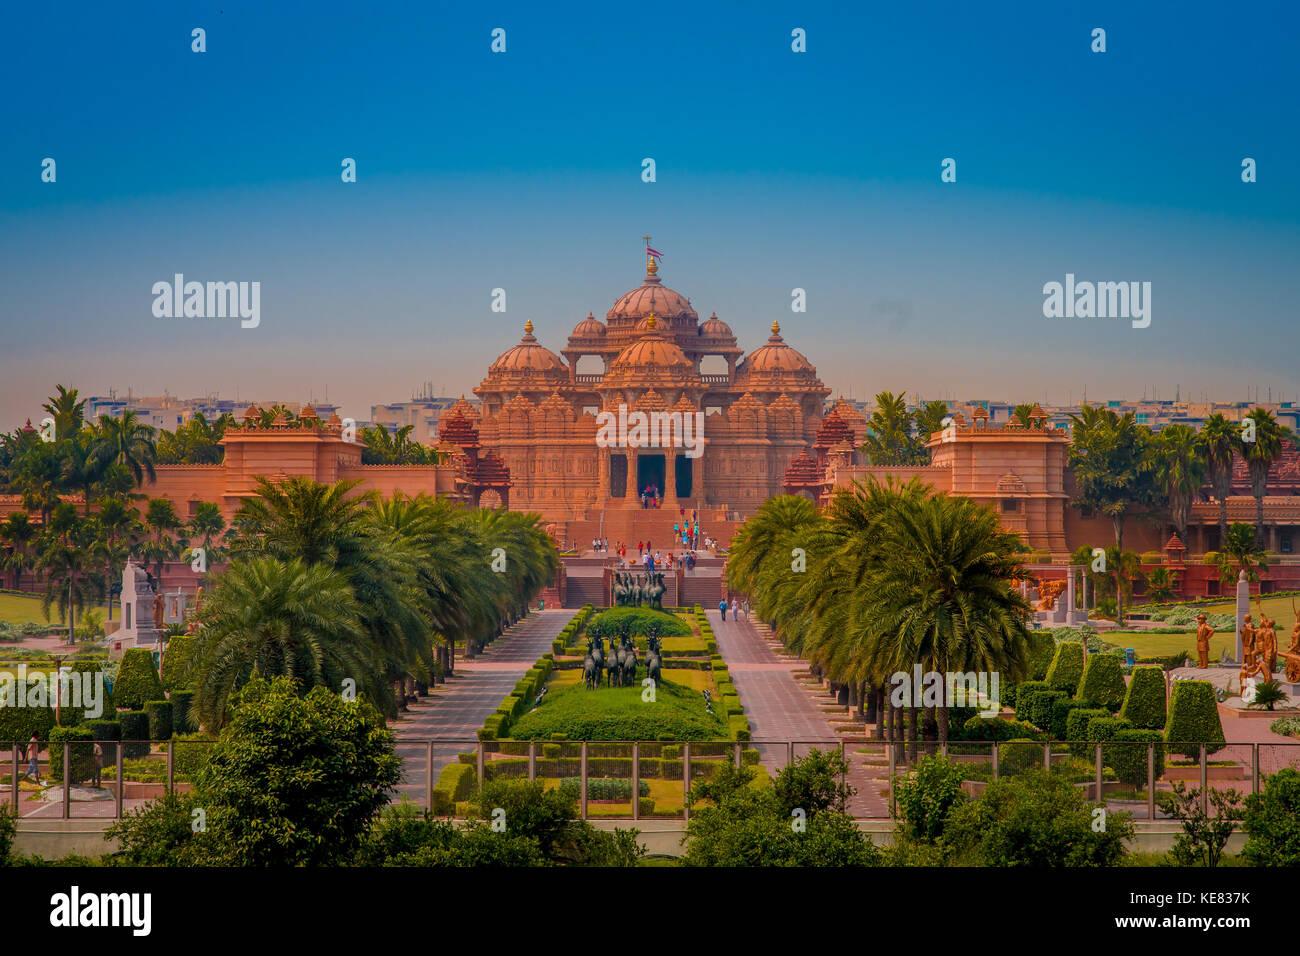 Jaipur, India - September 19, 2017: Akshardham Temple in New Delhi, India. Akshardham or Swaminarayan Akshardham - Stock Image